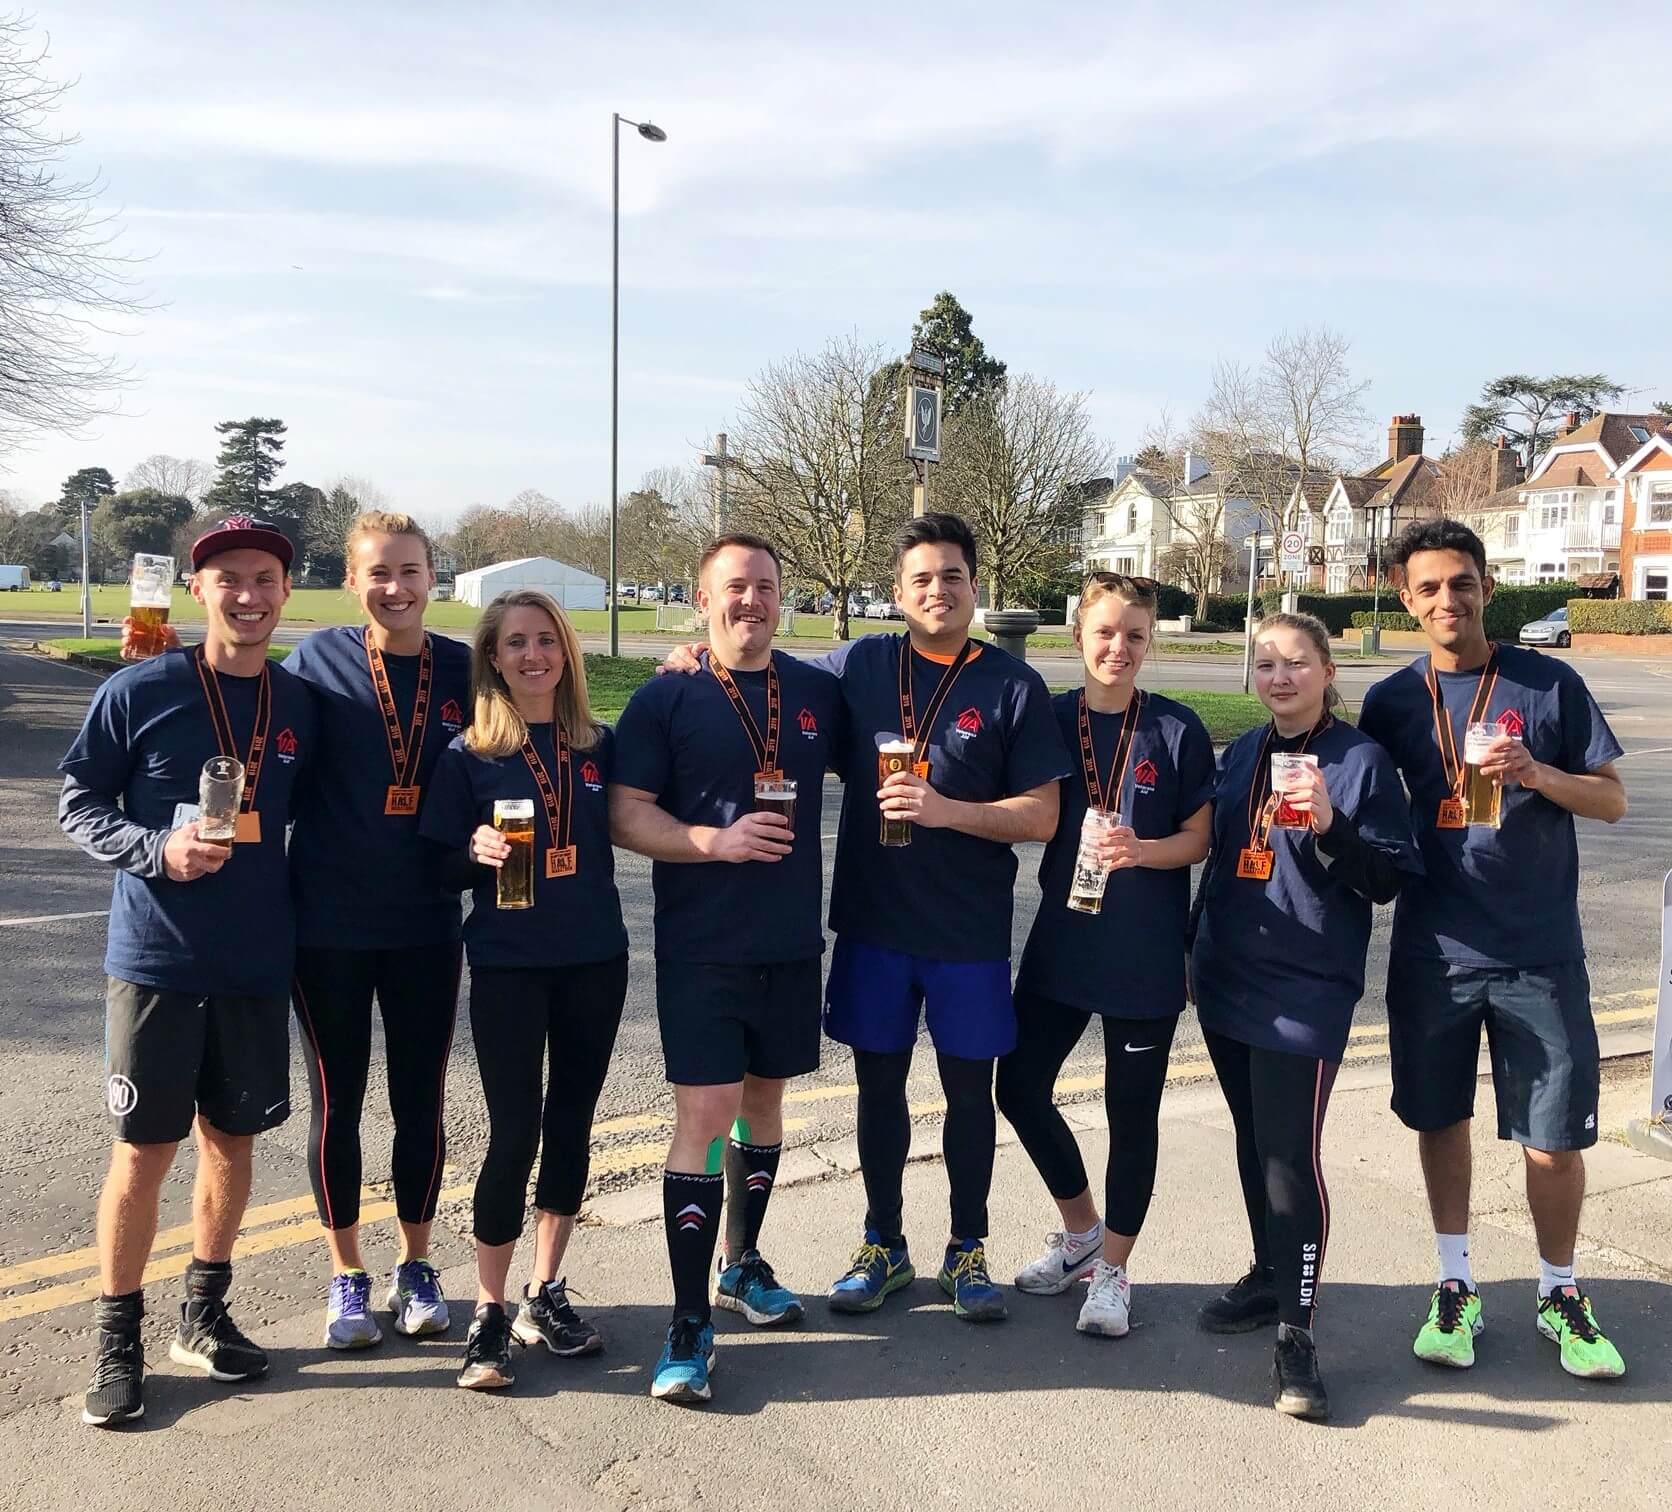 D&G Hampton Court Half Marathon